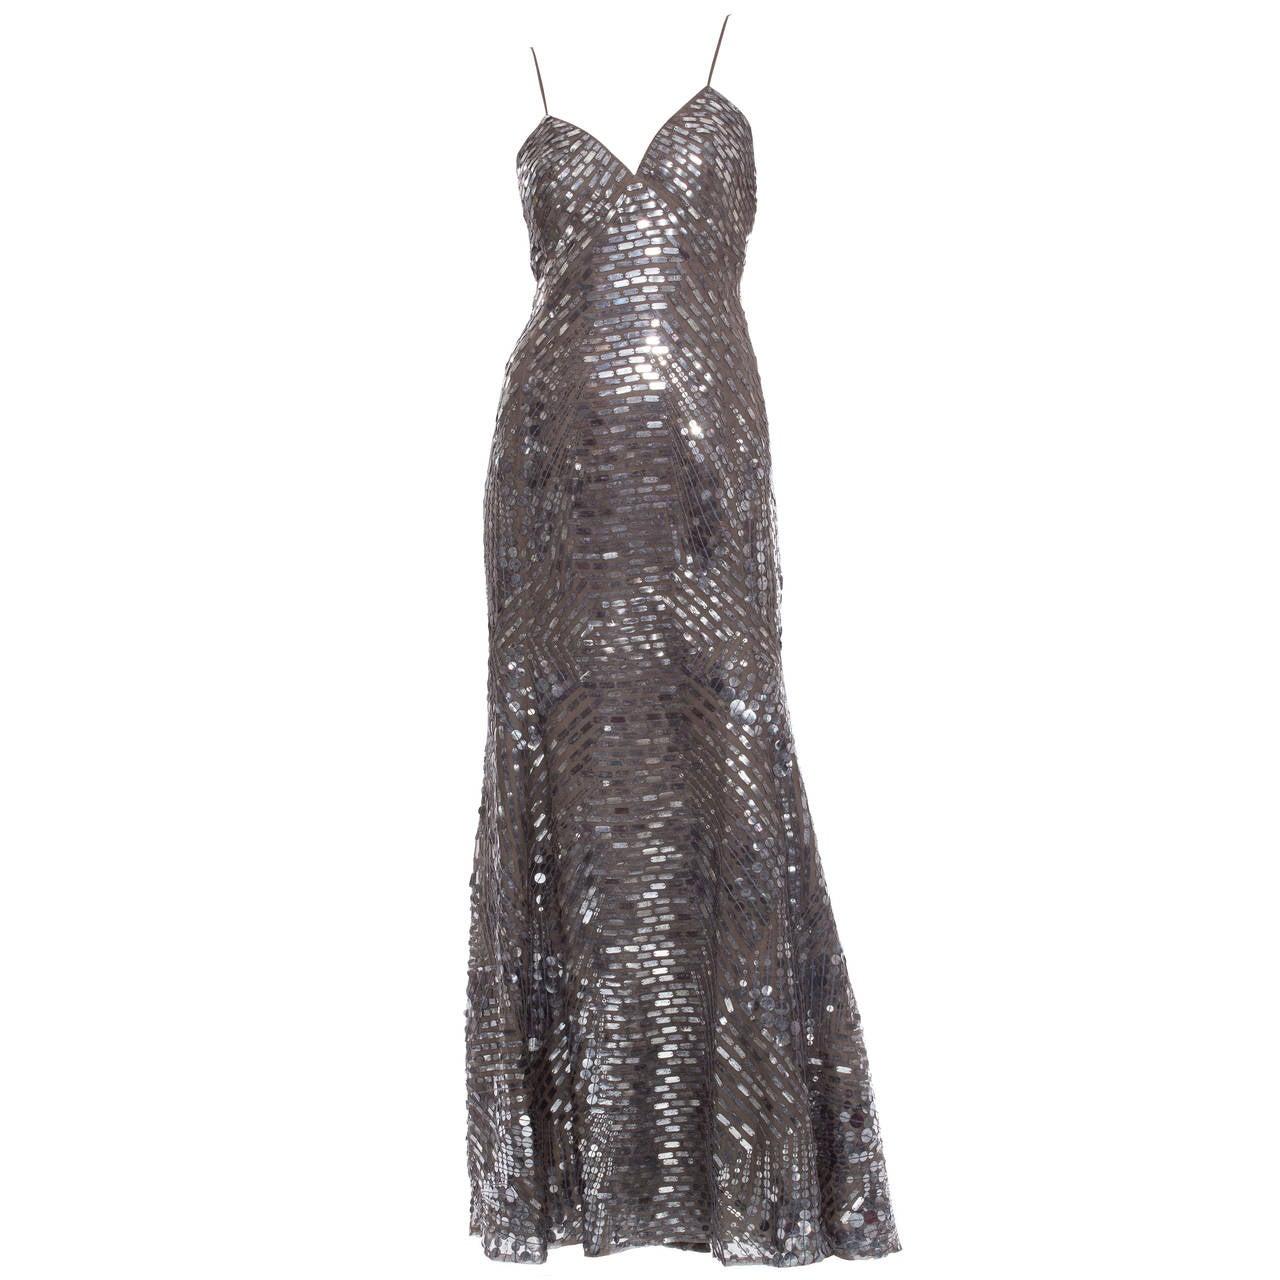 Oscar De la Renta Silk Evening Dress With Pewter Embellishments, Fall 2007 1